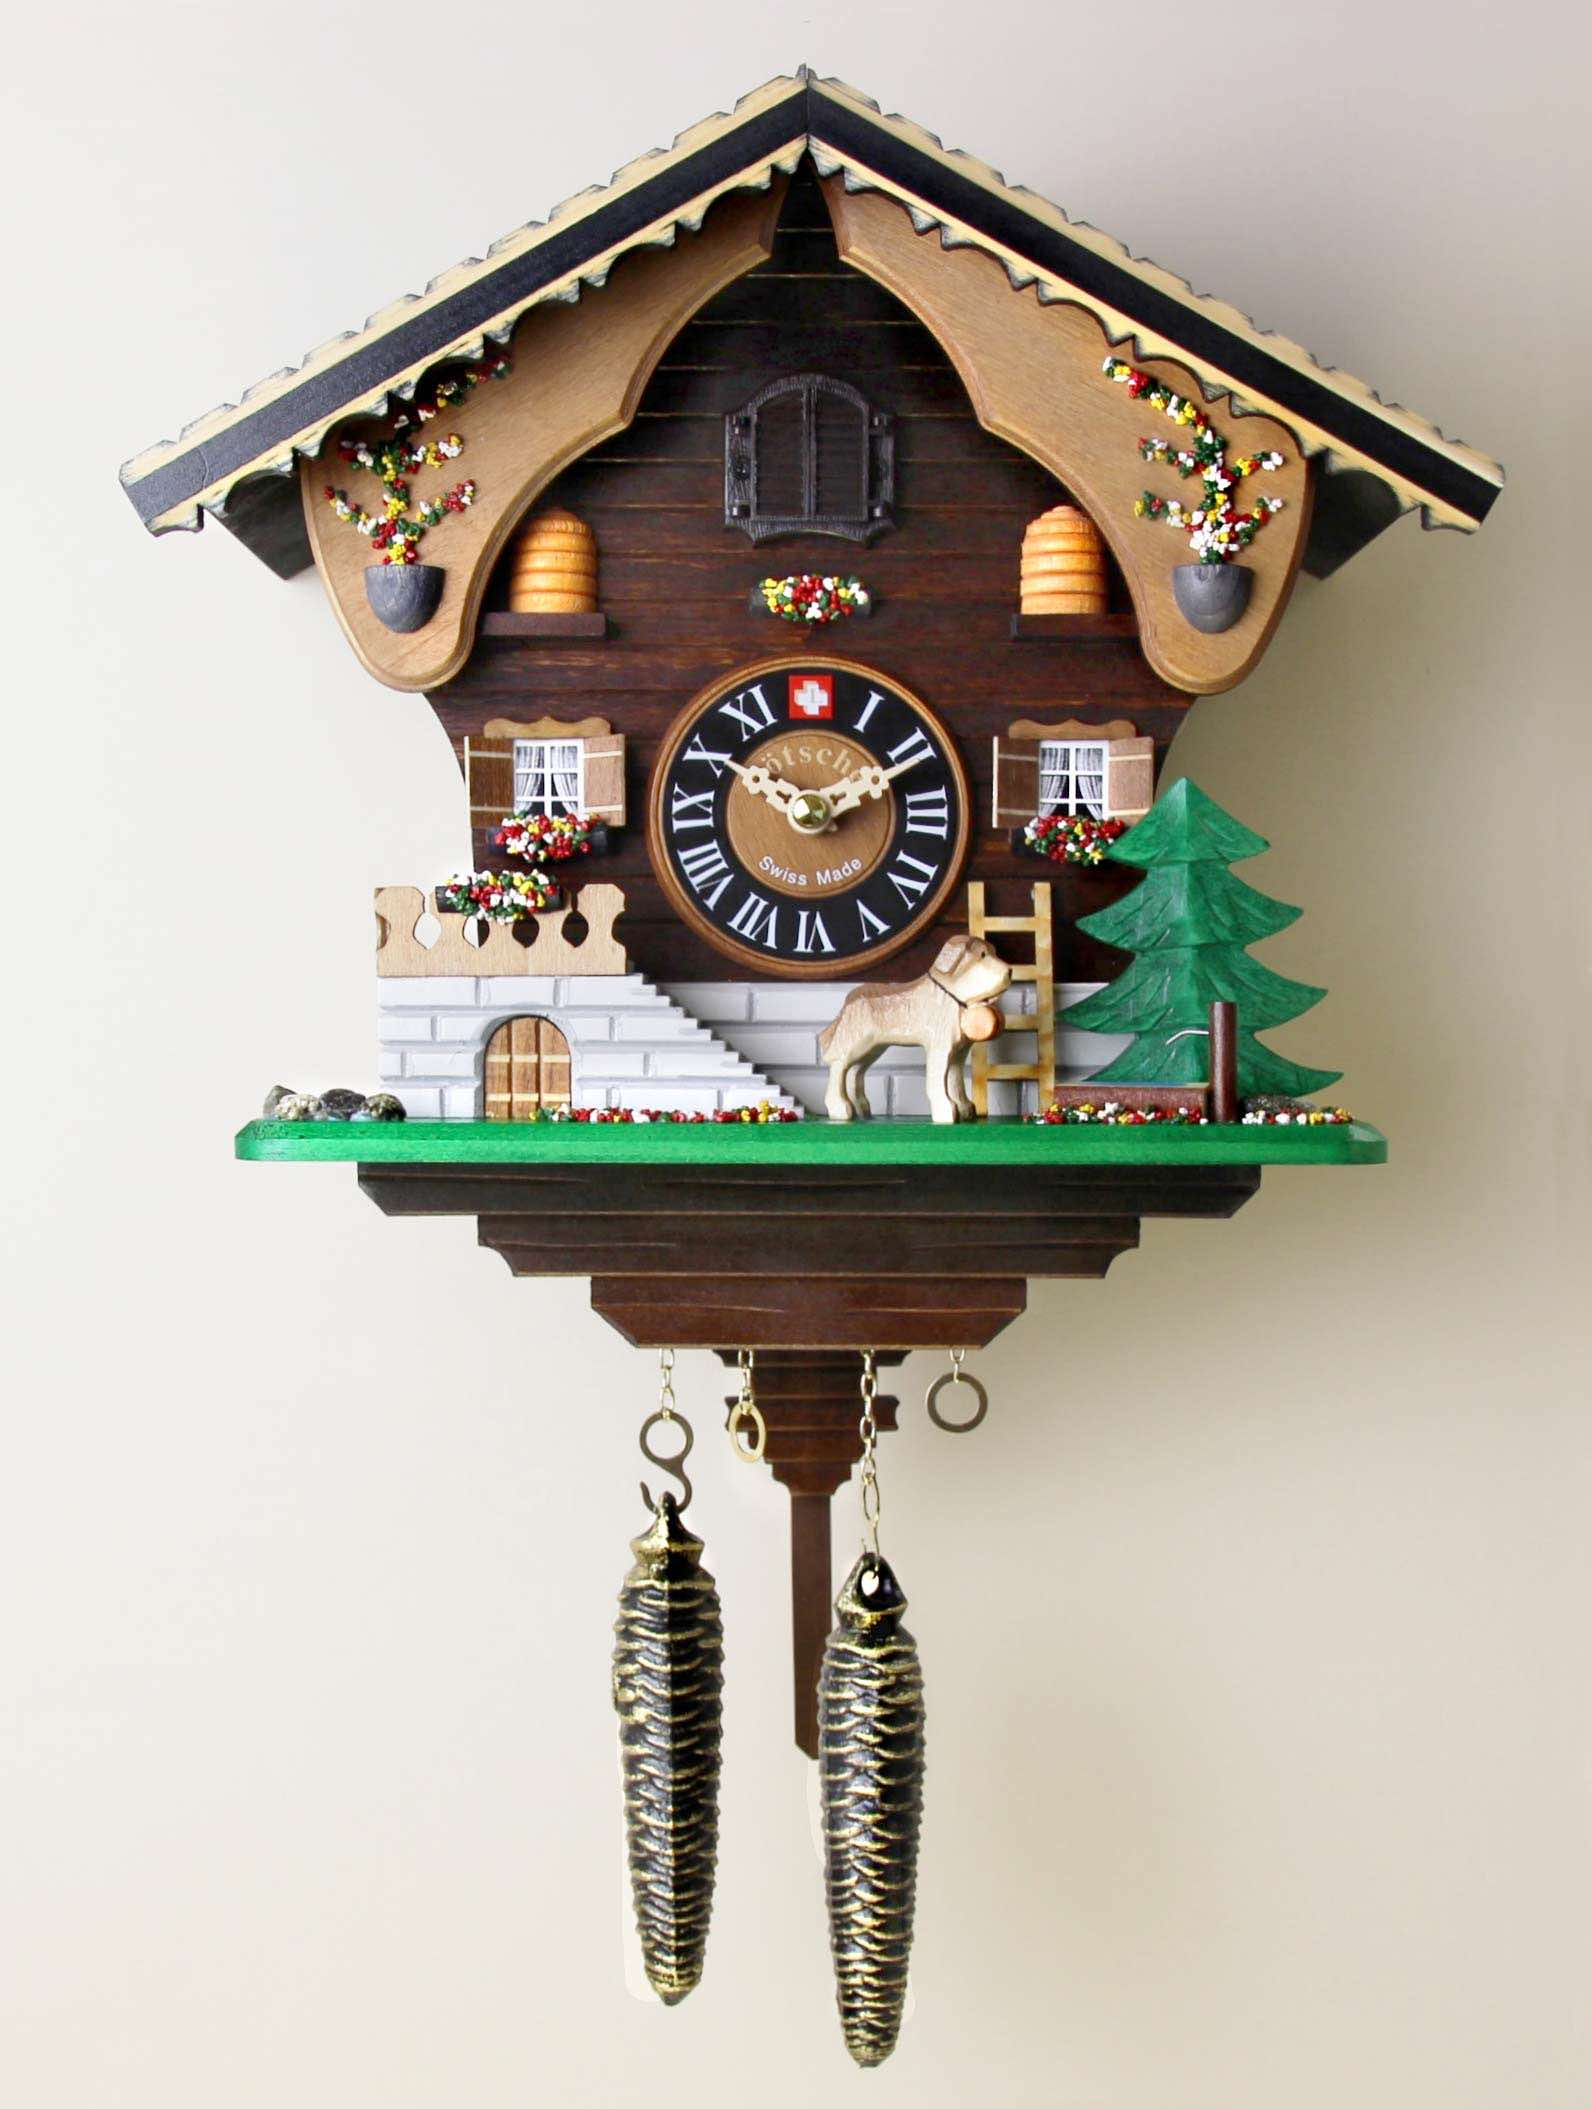 L tscher cuckoo clock cuckoo clock by l tscher watches clocks - Cuckoo watches ...